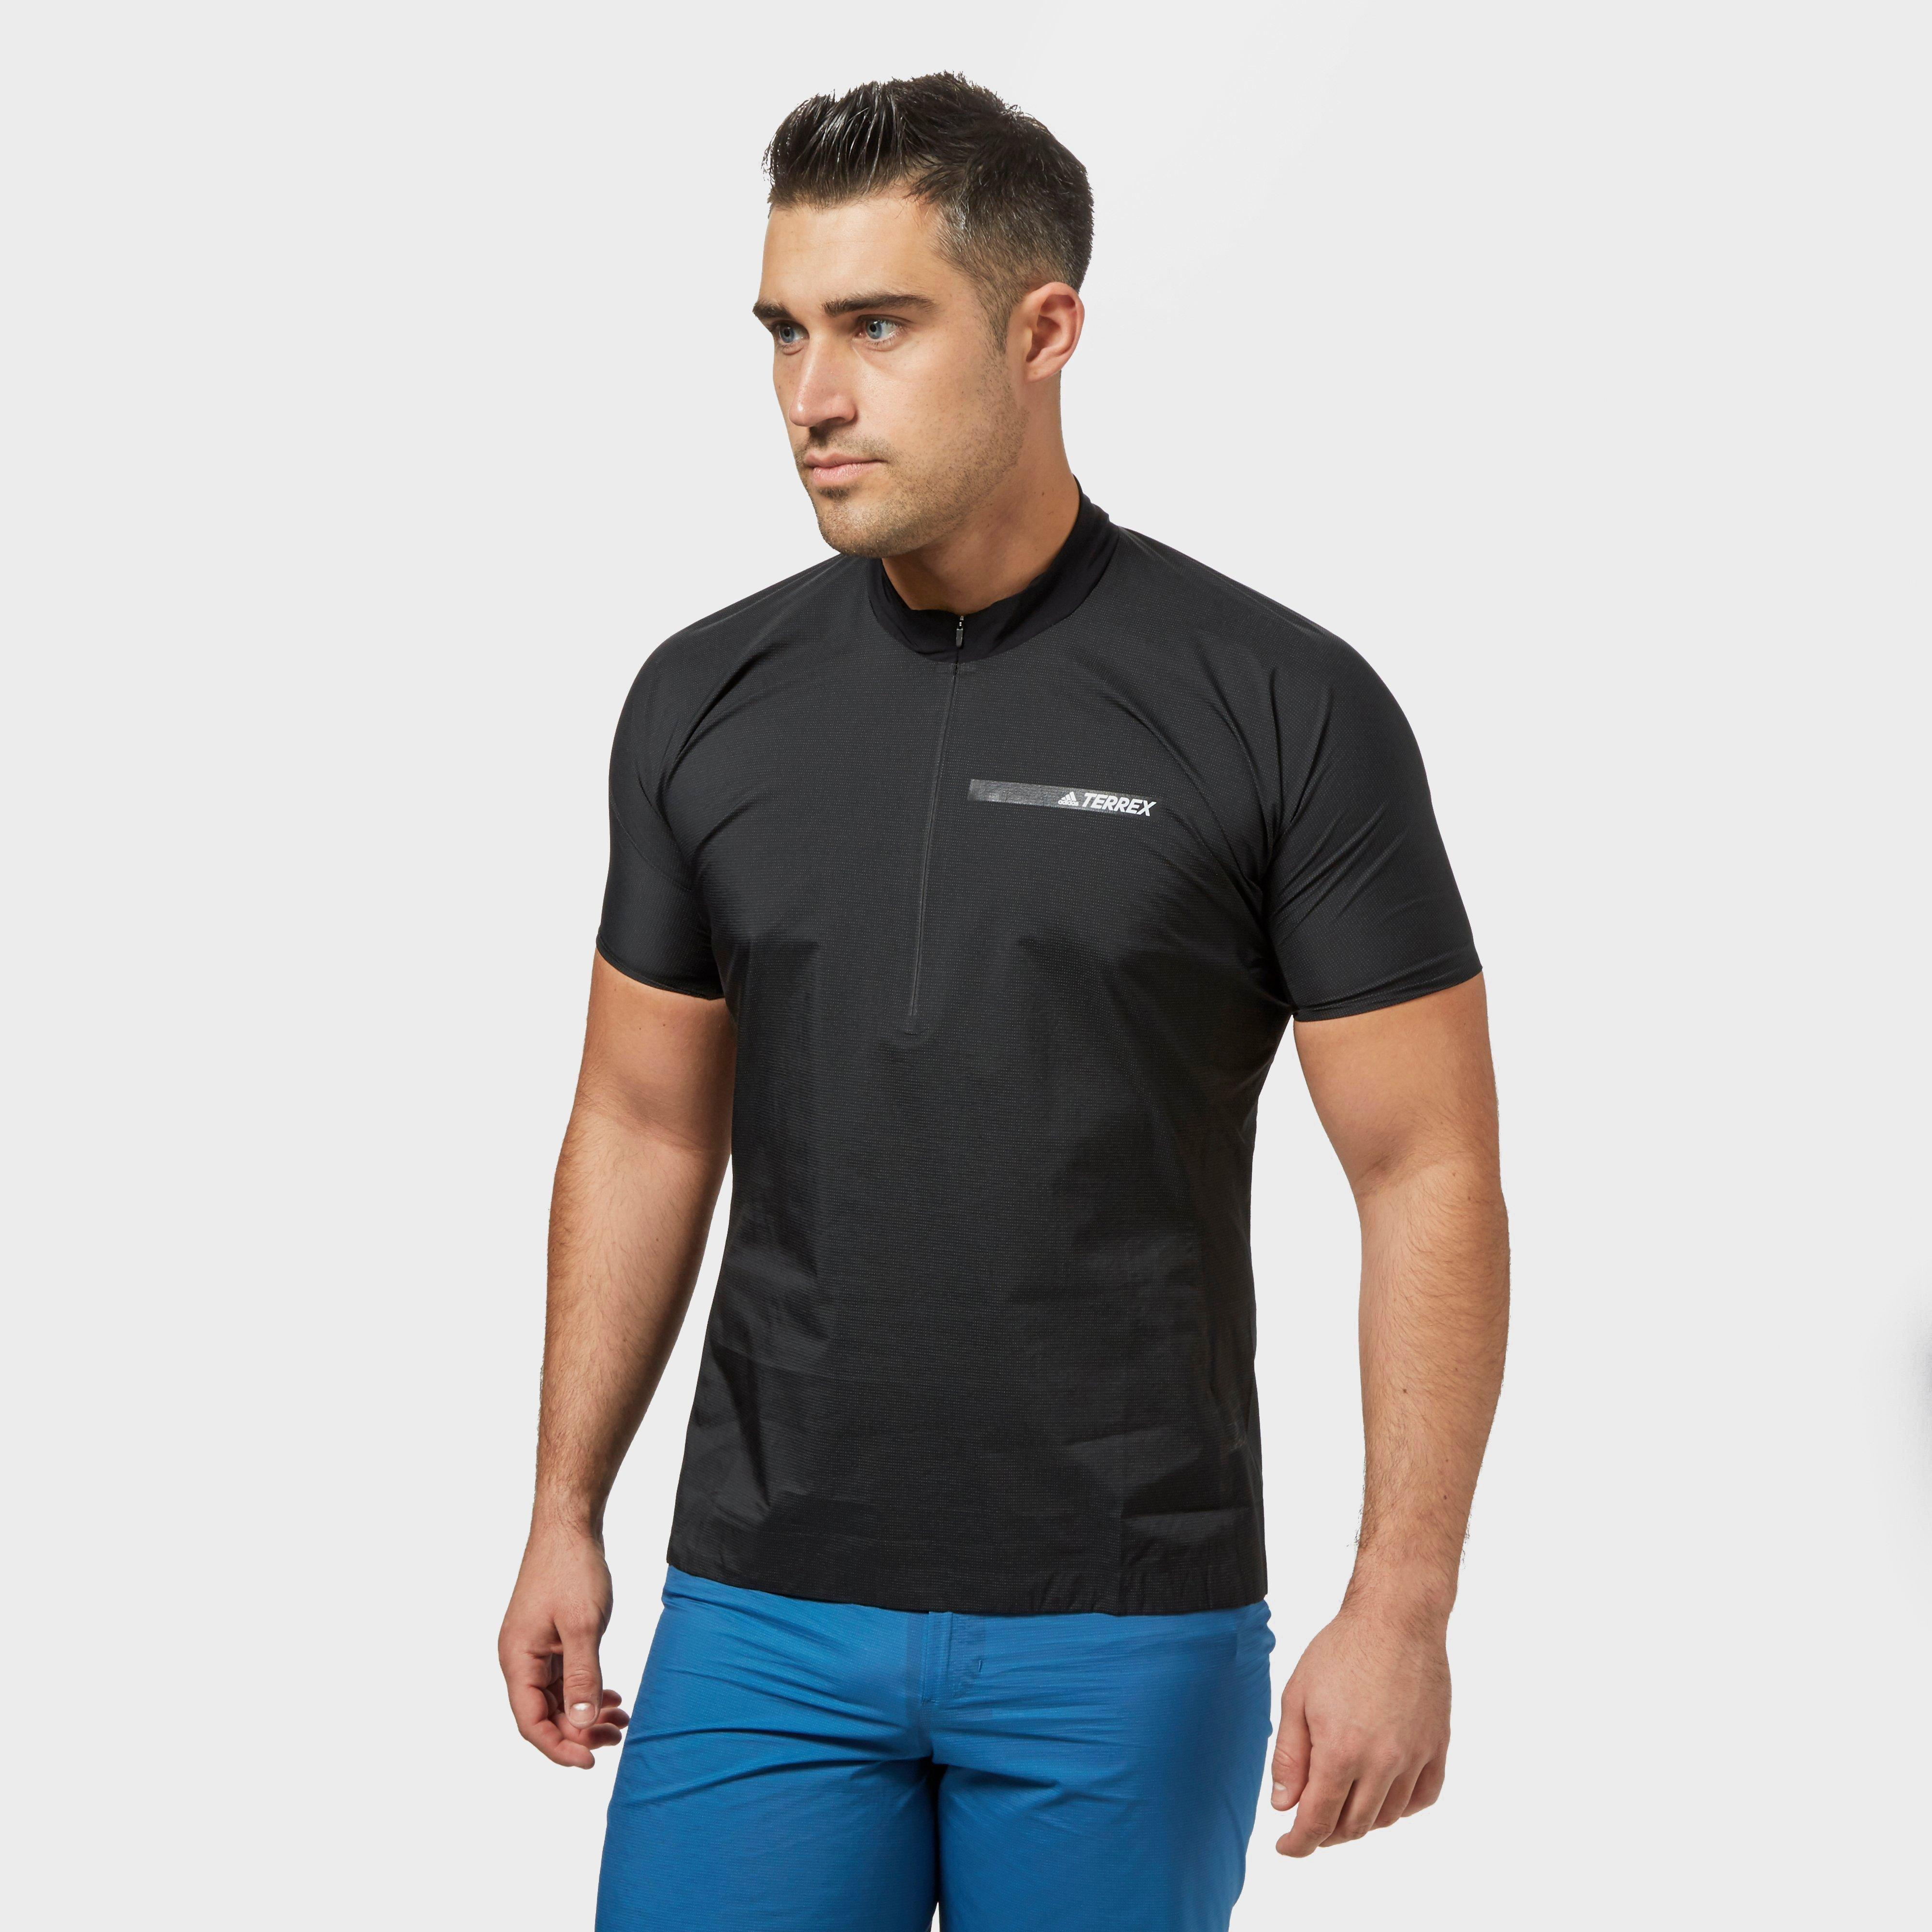 Image of Adidas Men's Agravic Terrex Windshirt, Black